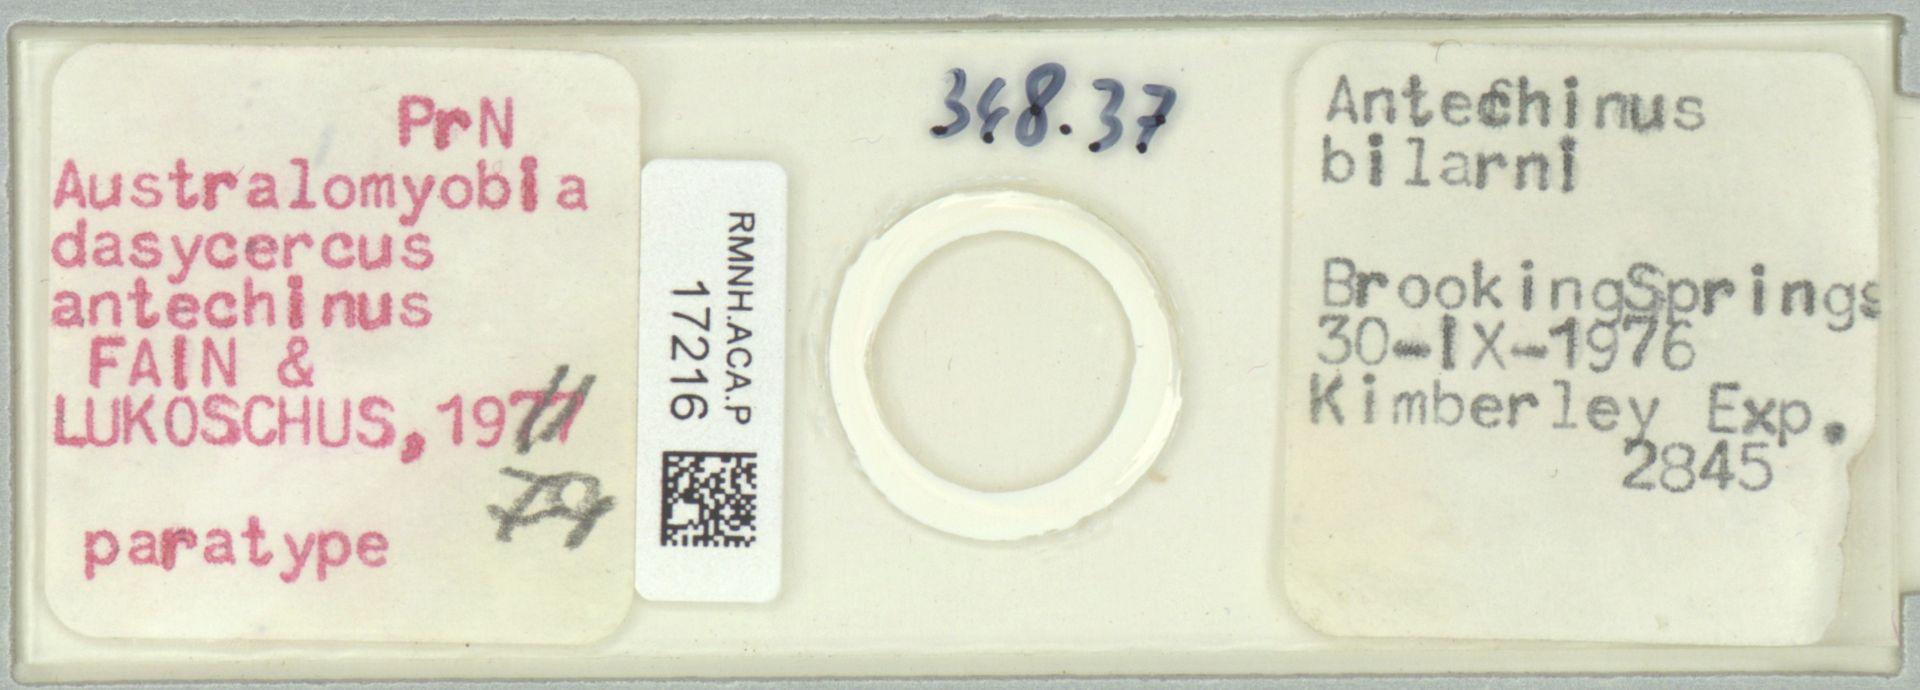 RMNH.ACA.P.17216 | Australomyobia dasycercus antechinus